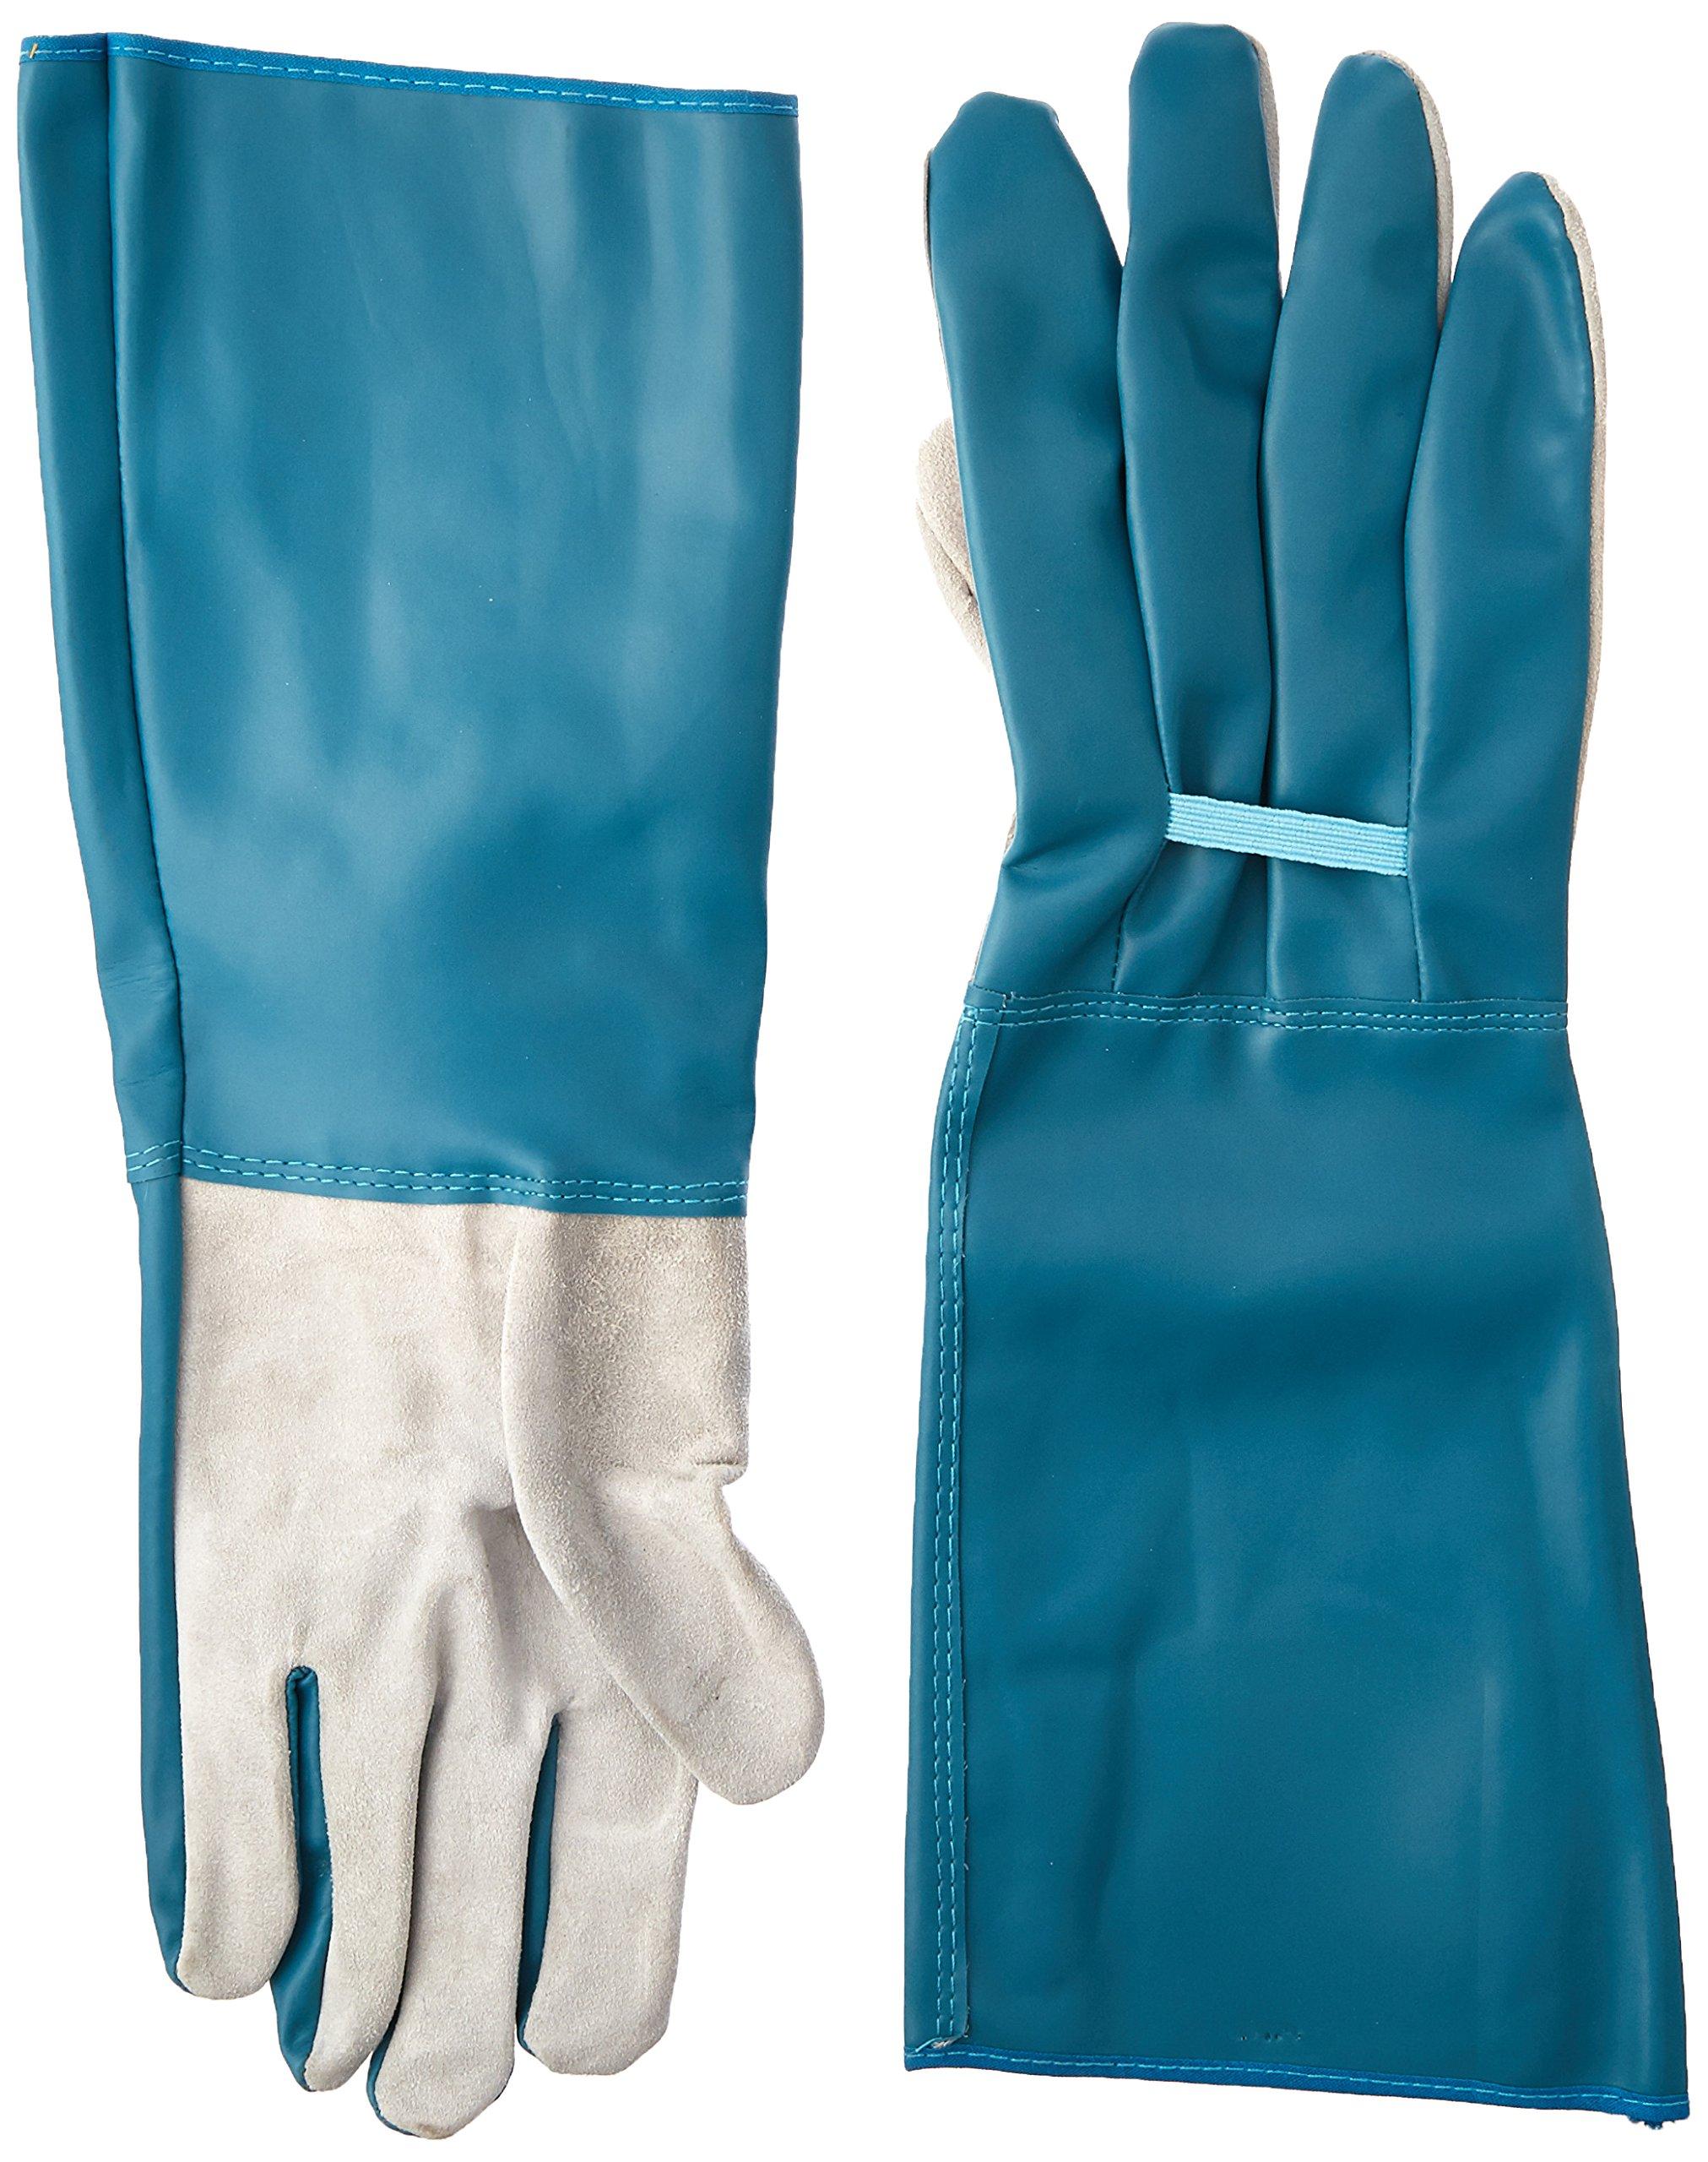 BOSS 8416 THORNgard Men's Gloves, green